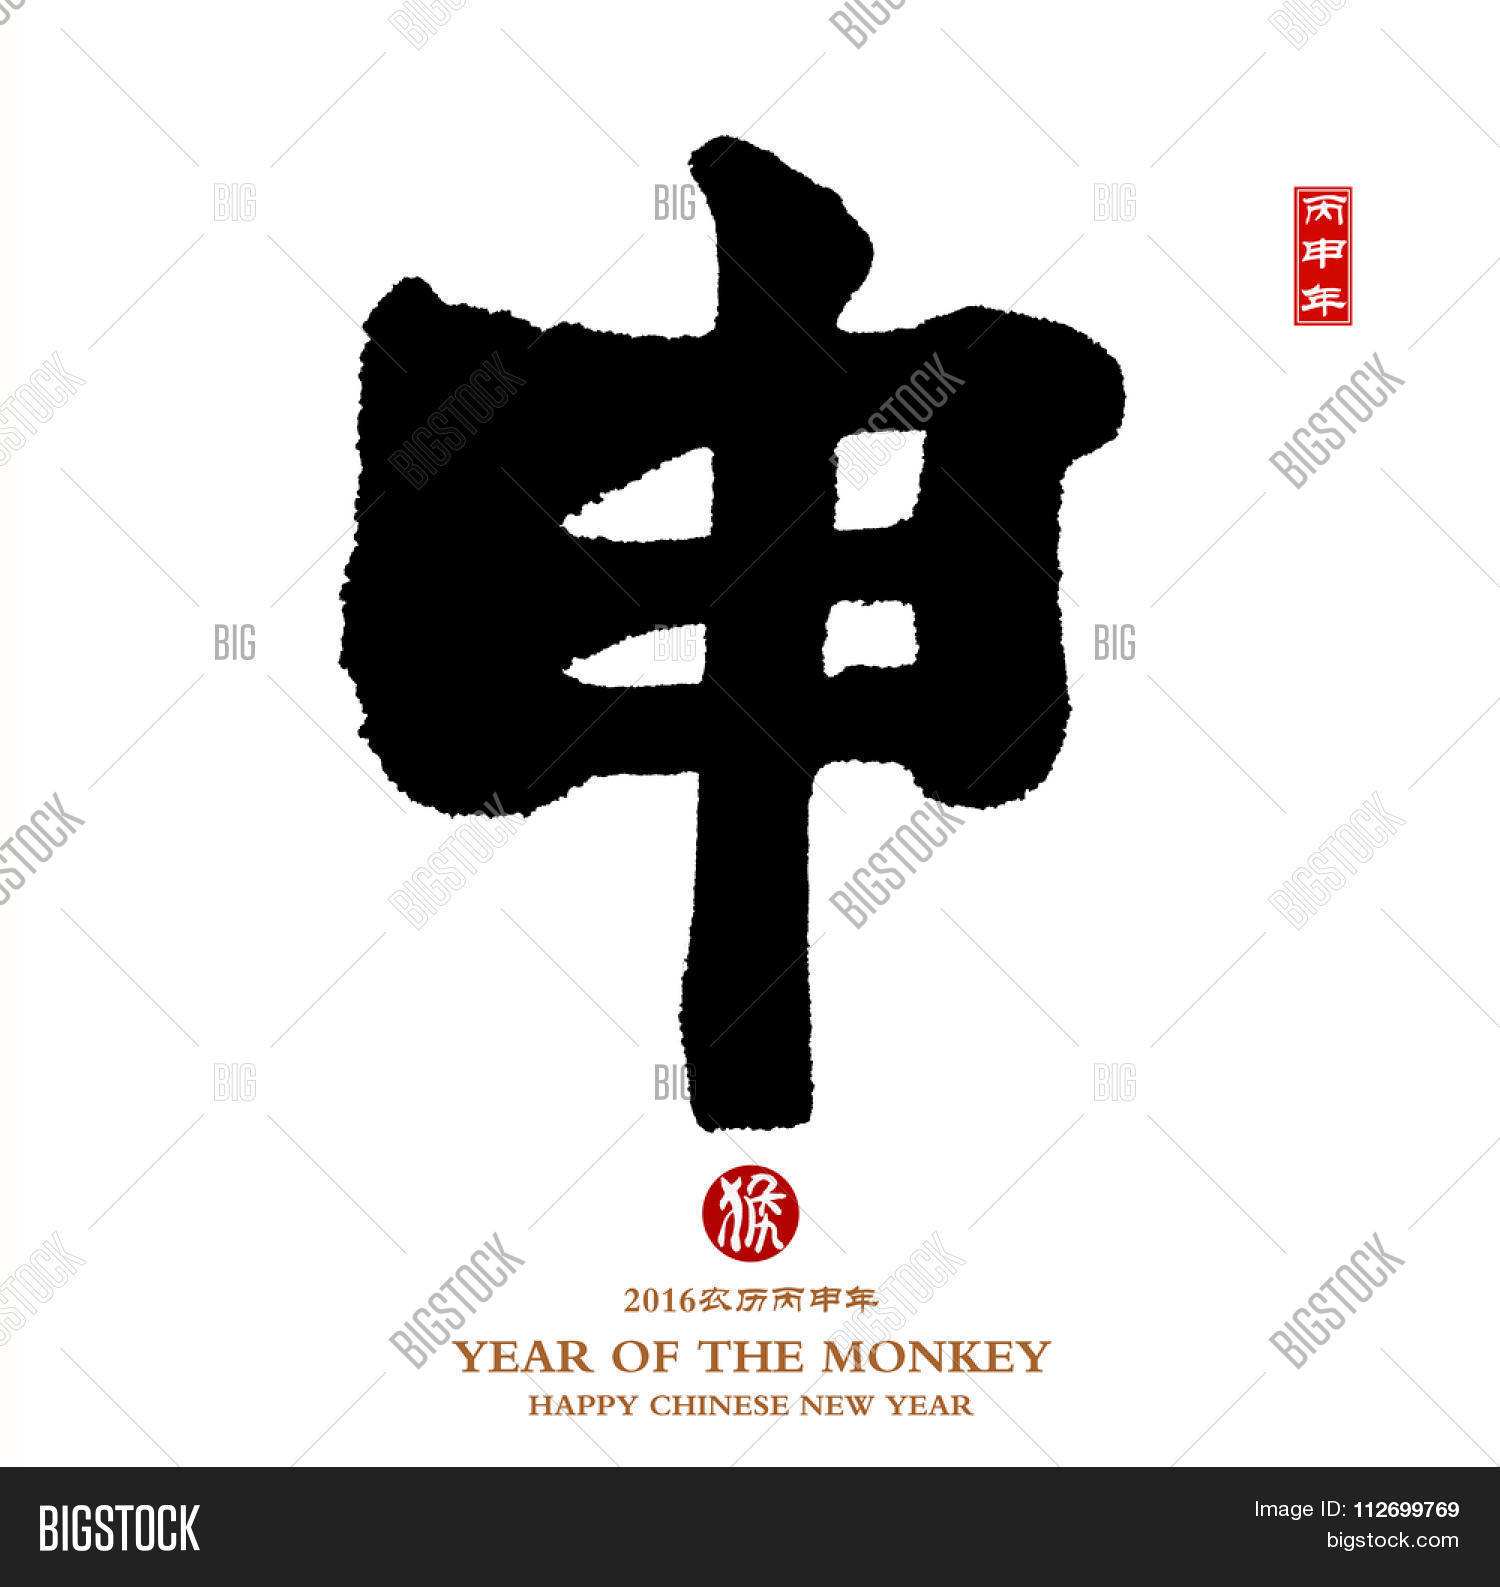 2016 Year Monkey Image Photo Free Trial Bigstock